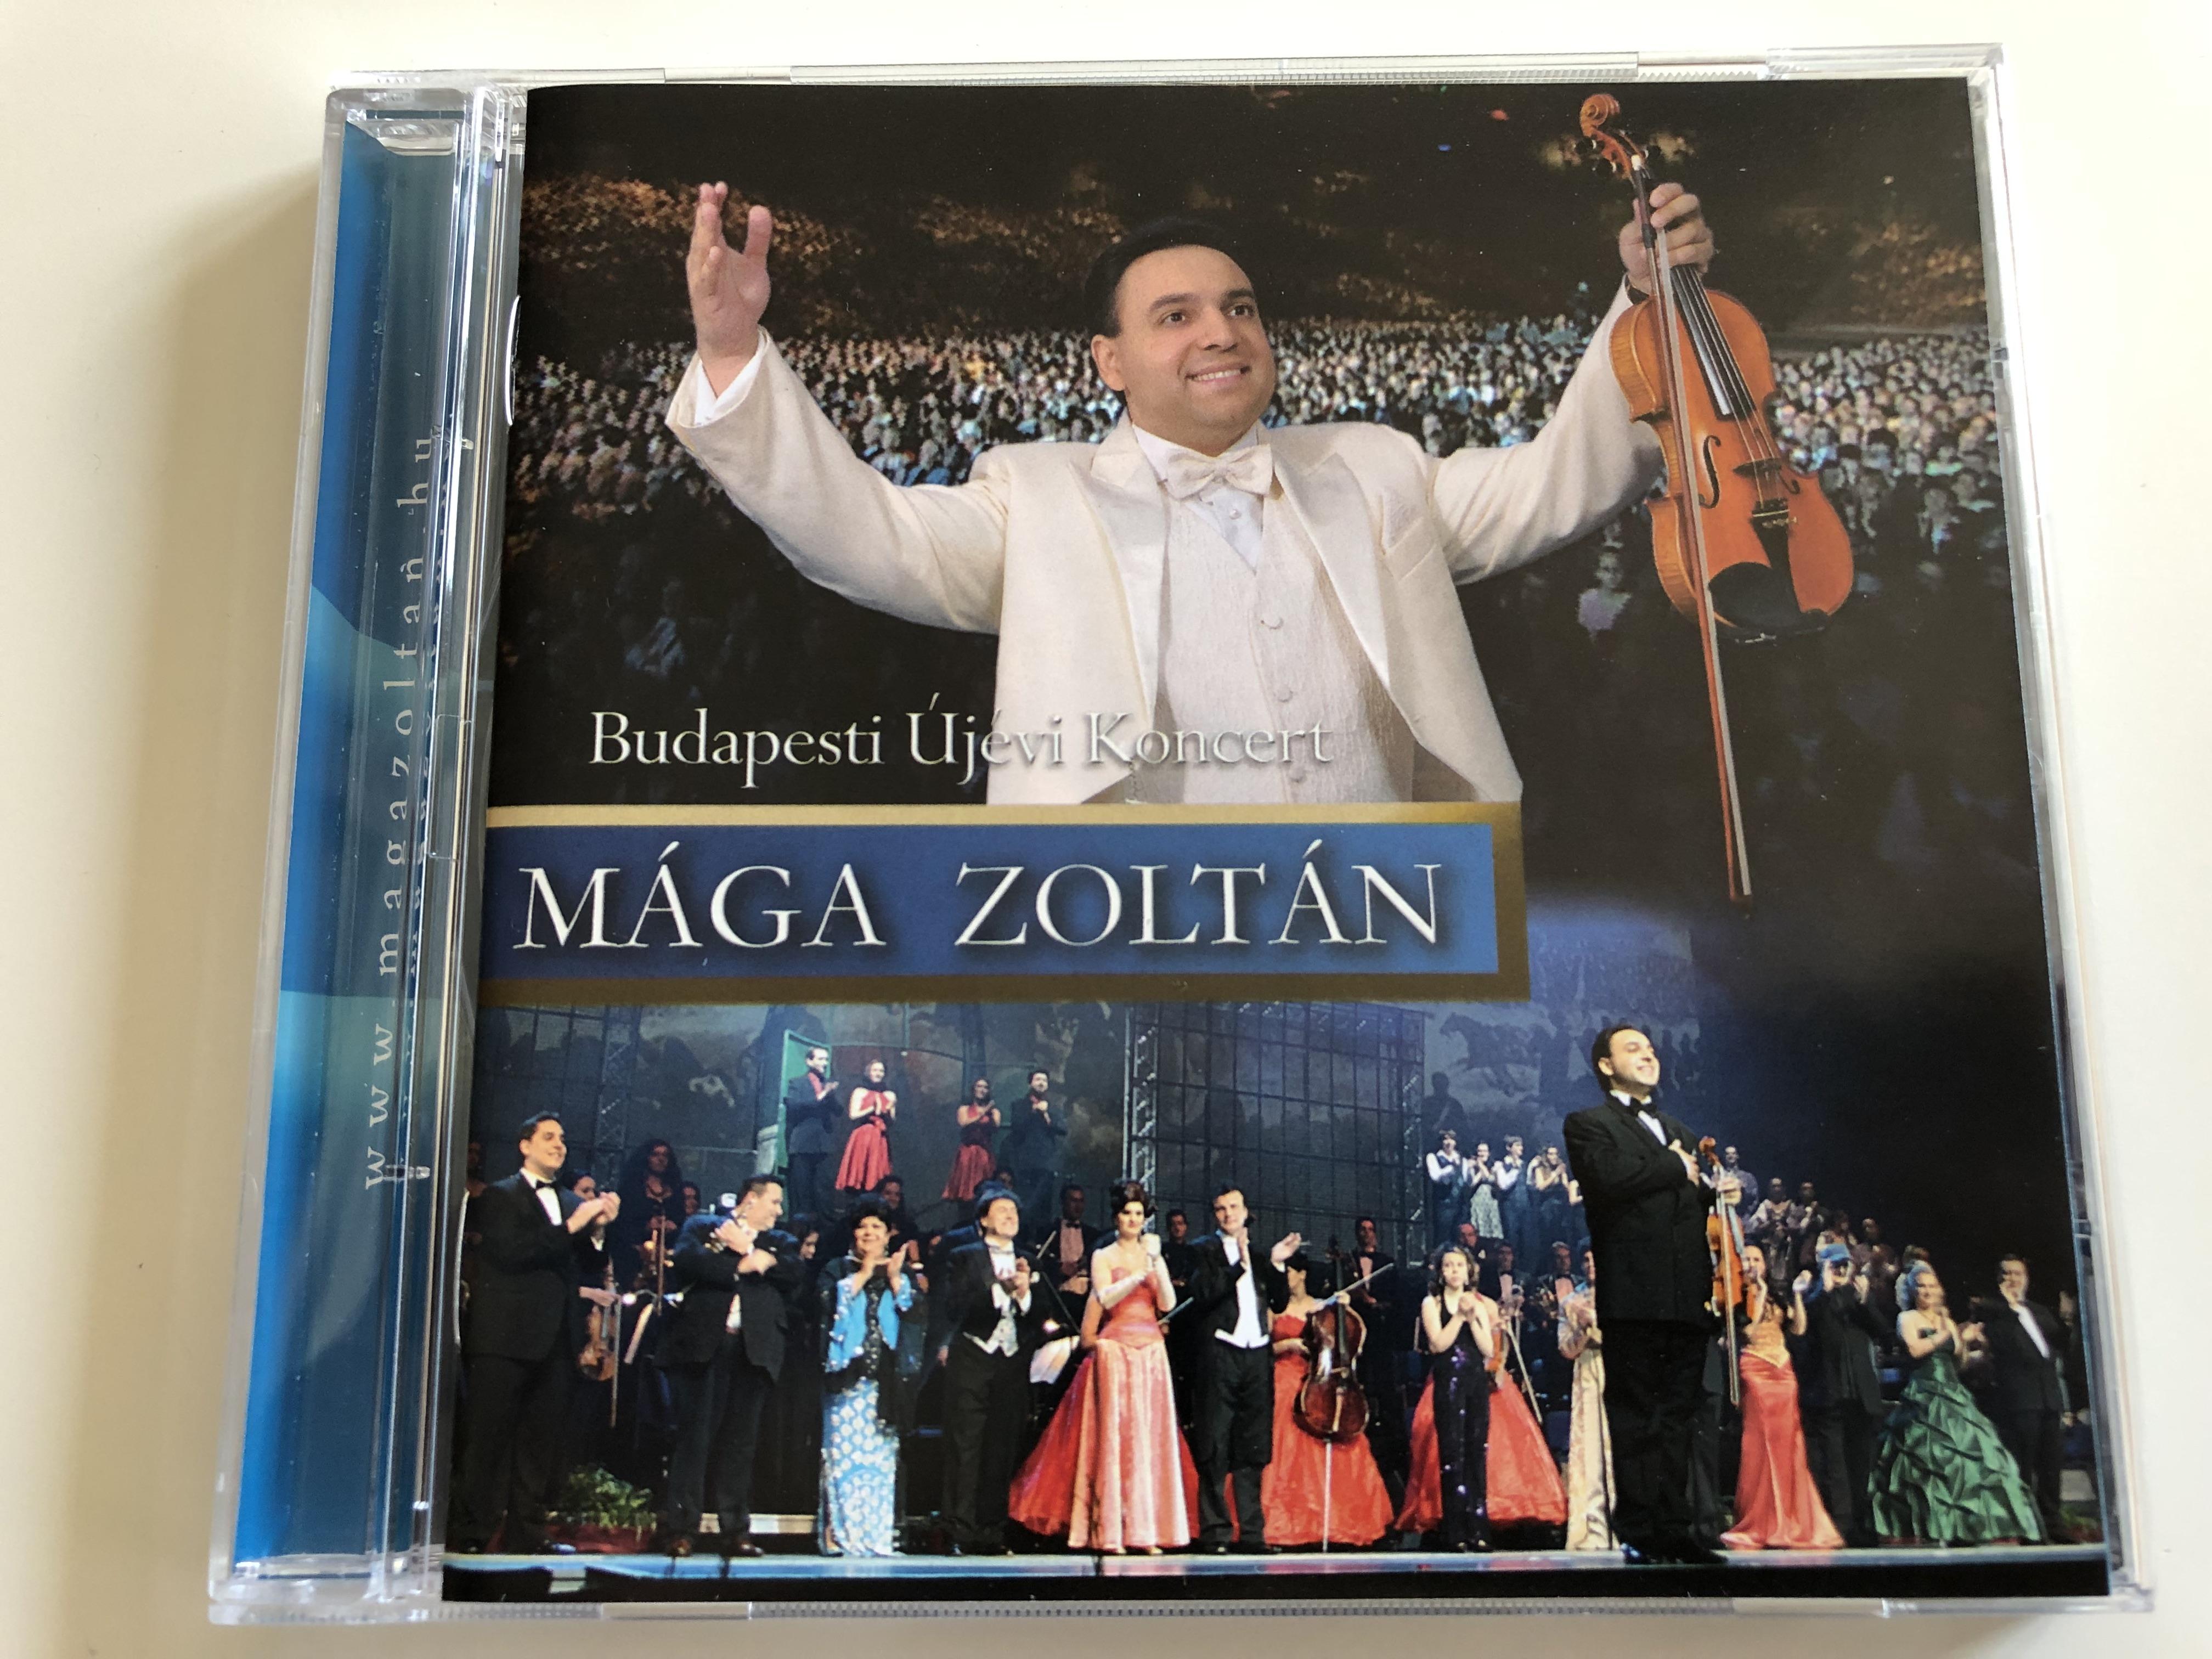 m-ga-zolt-n-budapesti-j-vi-koncert-2009-zen-s-utaz-s-a-vil-g-k-r-l-sony-music-entertainment-m-ga-zolt-n-s-szt-rvend-gei-audio-cd-2009-1-.jpg